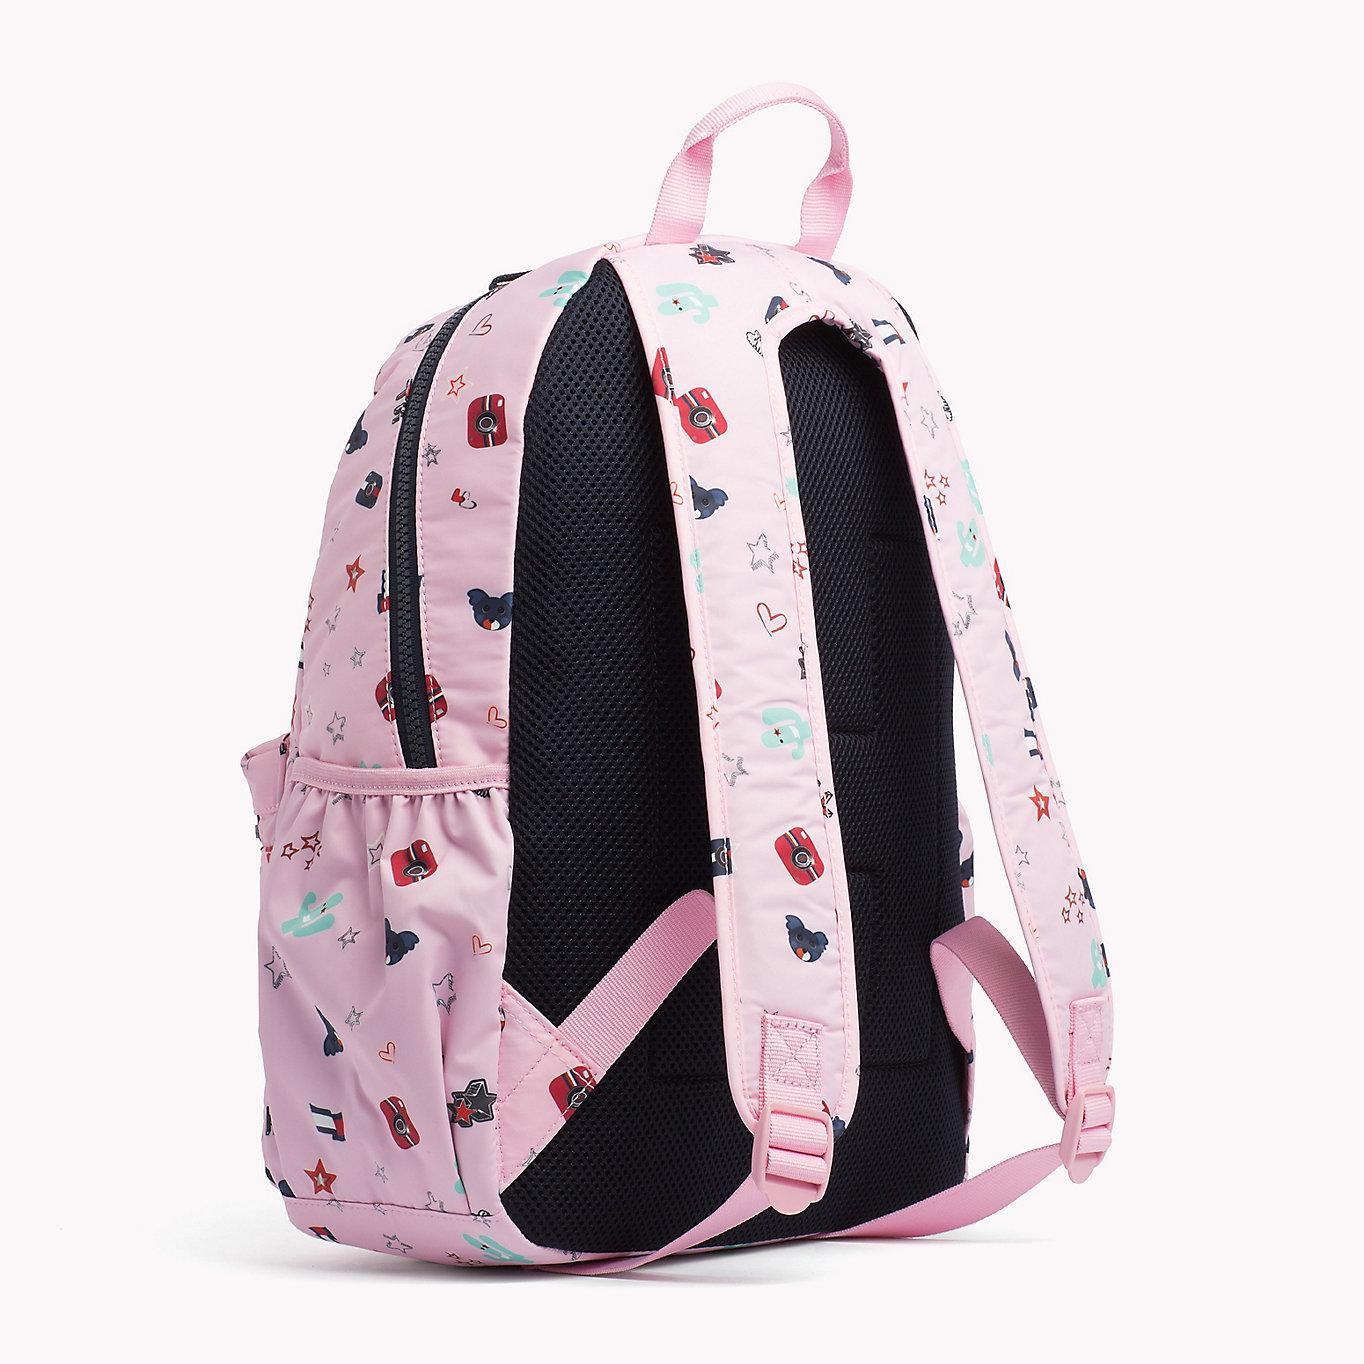 Tommy Hilfiger Kids Cactus Print Backpack At 70 Love The Brands